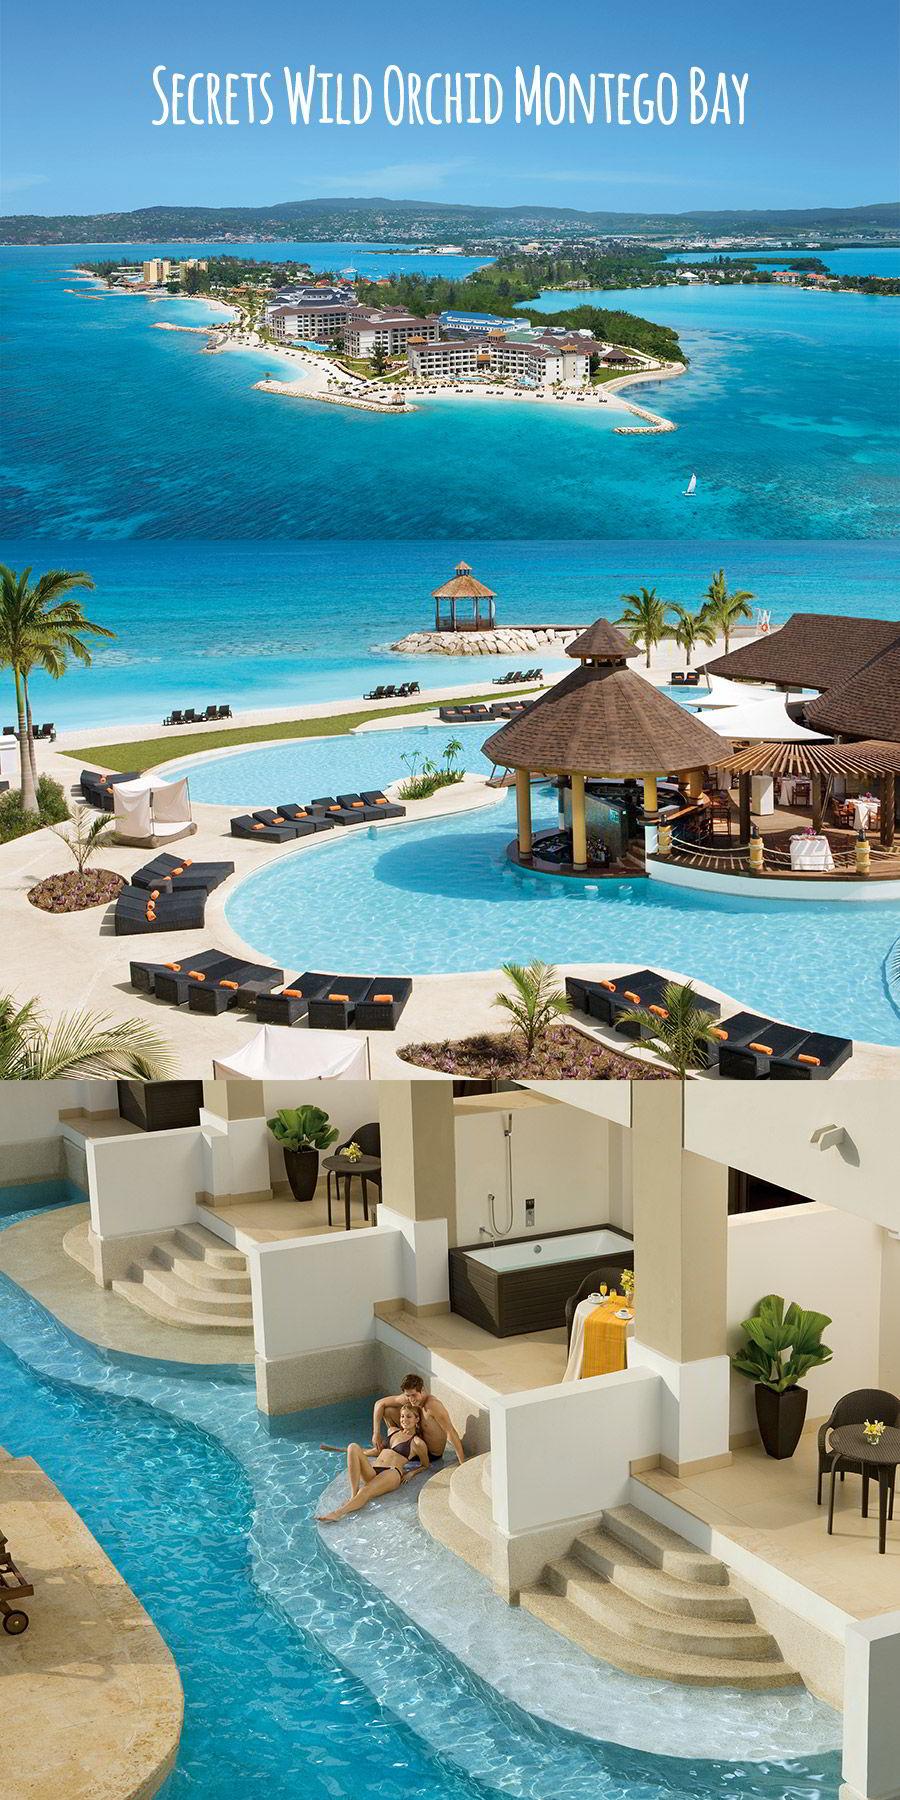 secrets resorts wild orchid montego bay jamaica destination wedding venue honymoon caribbean private island pool swim out suite couple